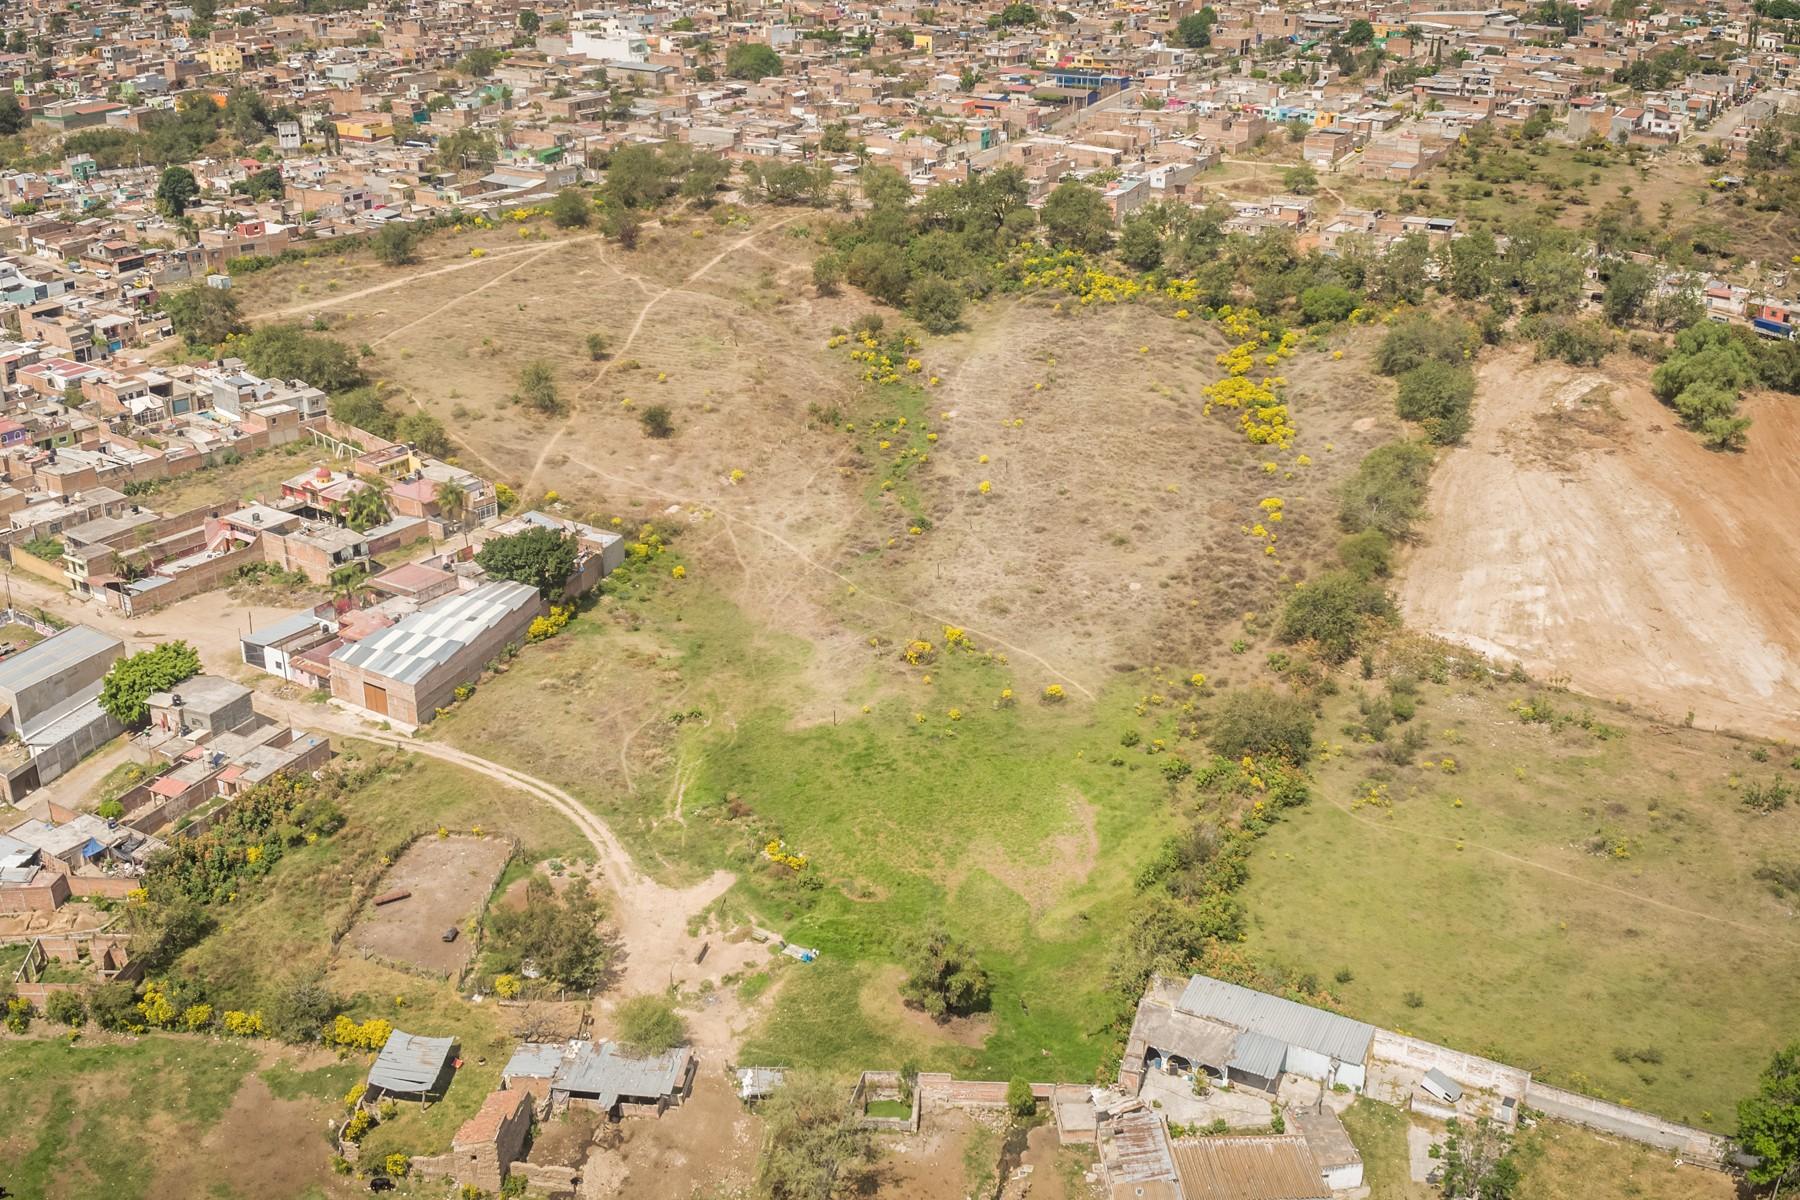 Additional photo for property listing at Lote para desarrollo habitacional H4 Xicoxochitl, Tonala, Jalisco Calle Xicoxochitl 13, Mirador de la Reyna Tonala Guadalajara, Jalisco 45400 México